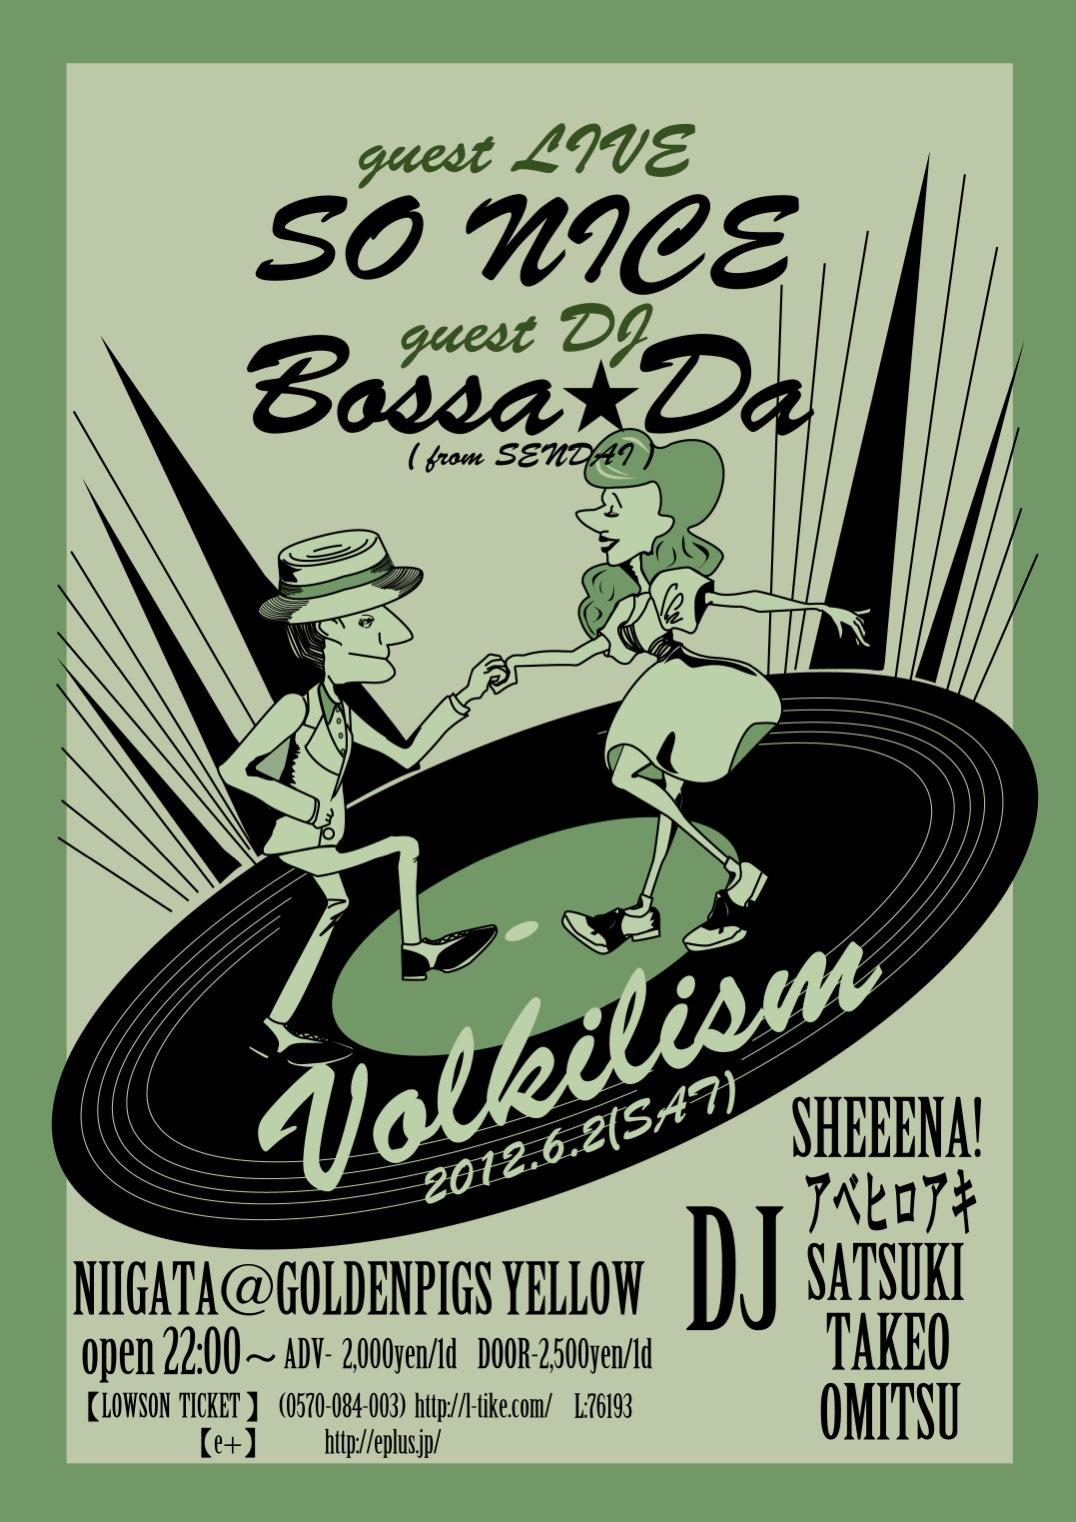 SPイベント開催決定!!! so nice LIVE!! GUEST DJ Bassa☆Da!!!_c0101260_2231311.jpg